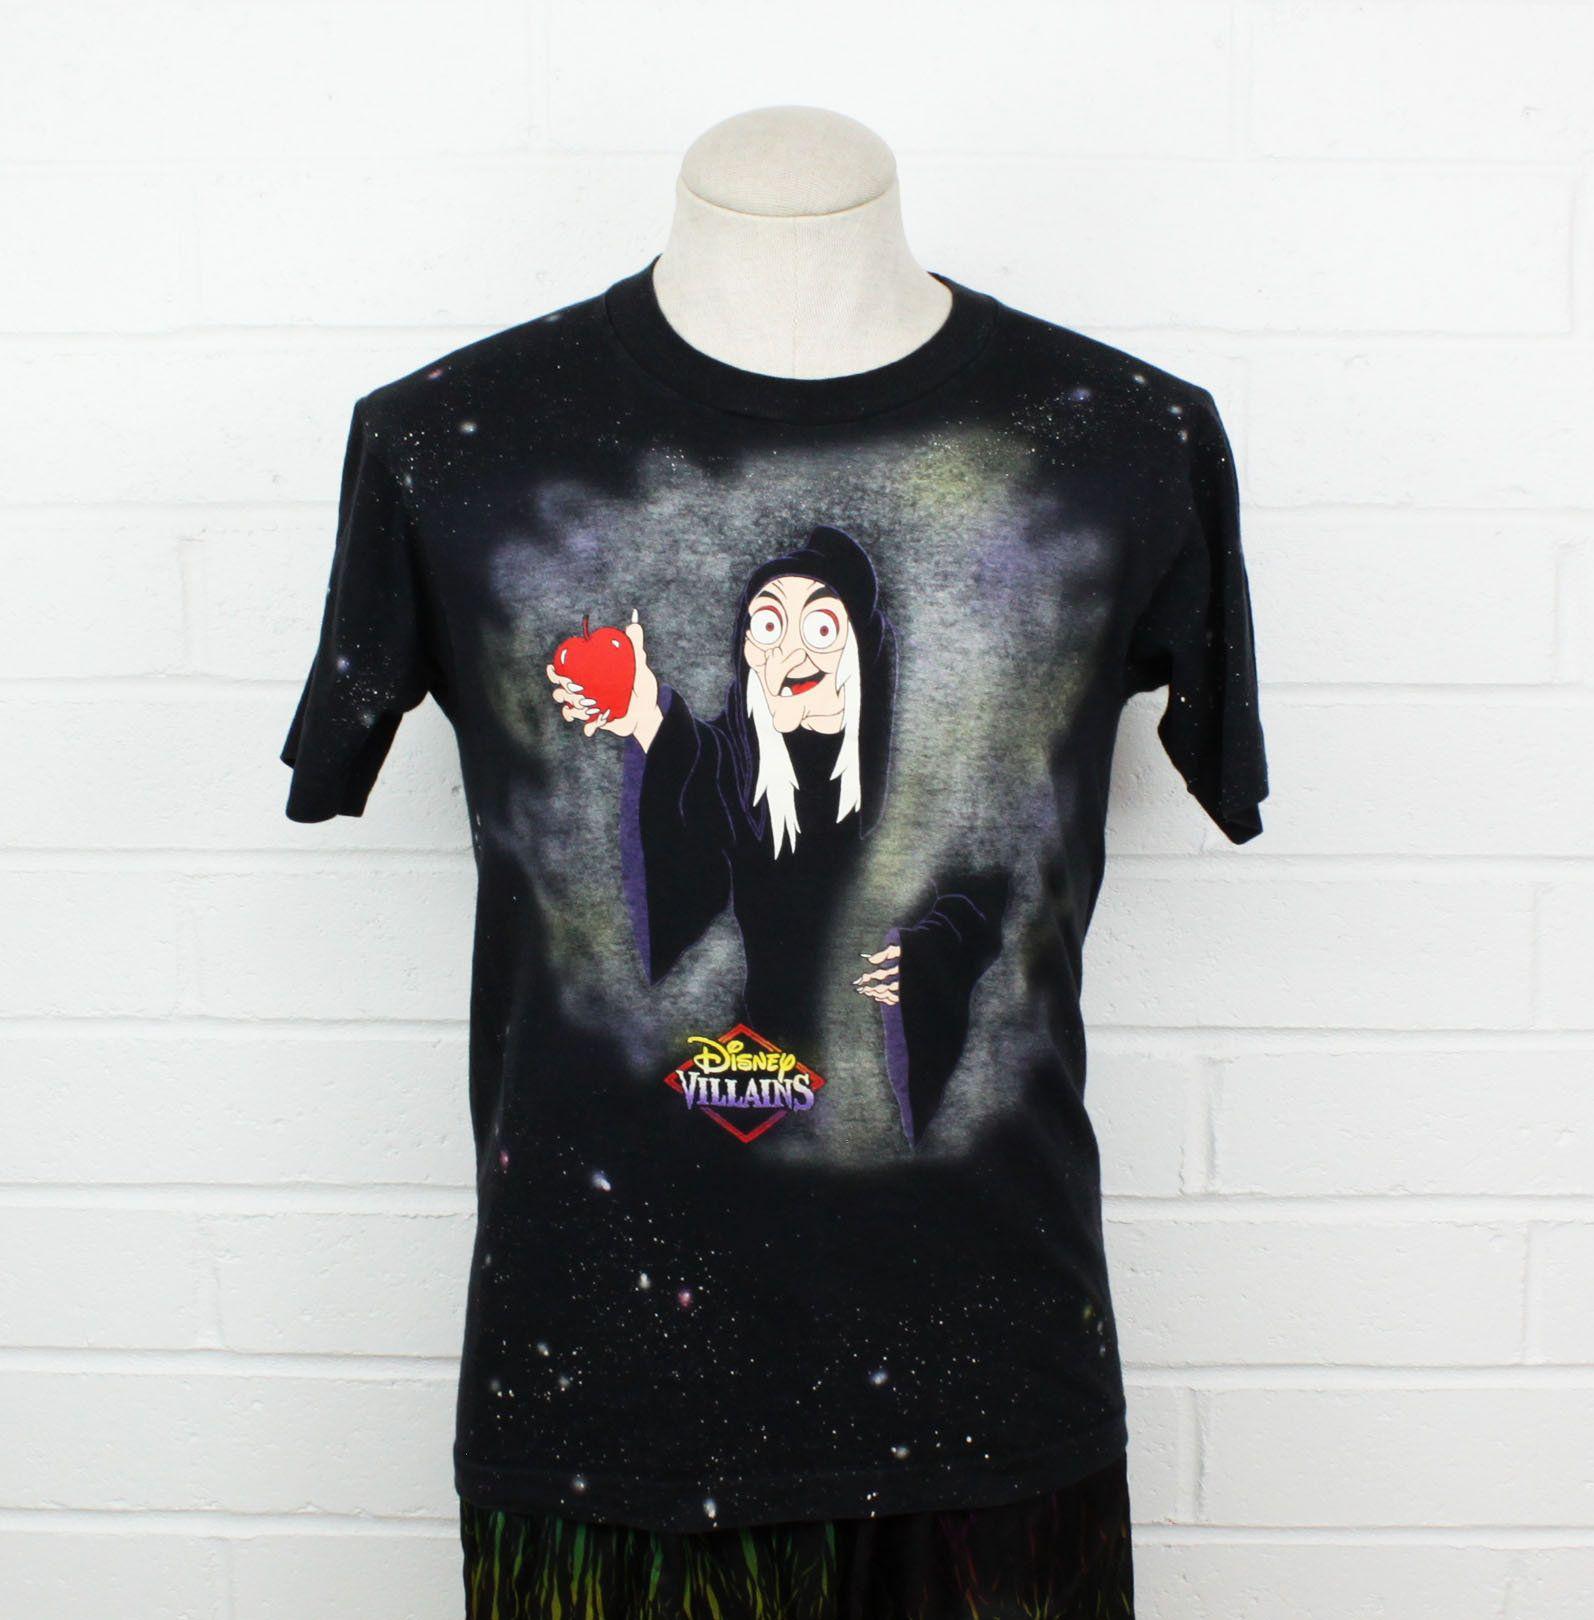 Vintage 90s Disney Villains Medium Shirt Maleficent Old Lady Black Graphic Tees Disney Shirts For Men Boys Summer Outfits